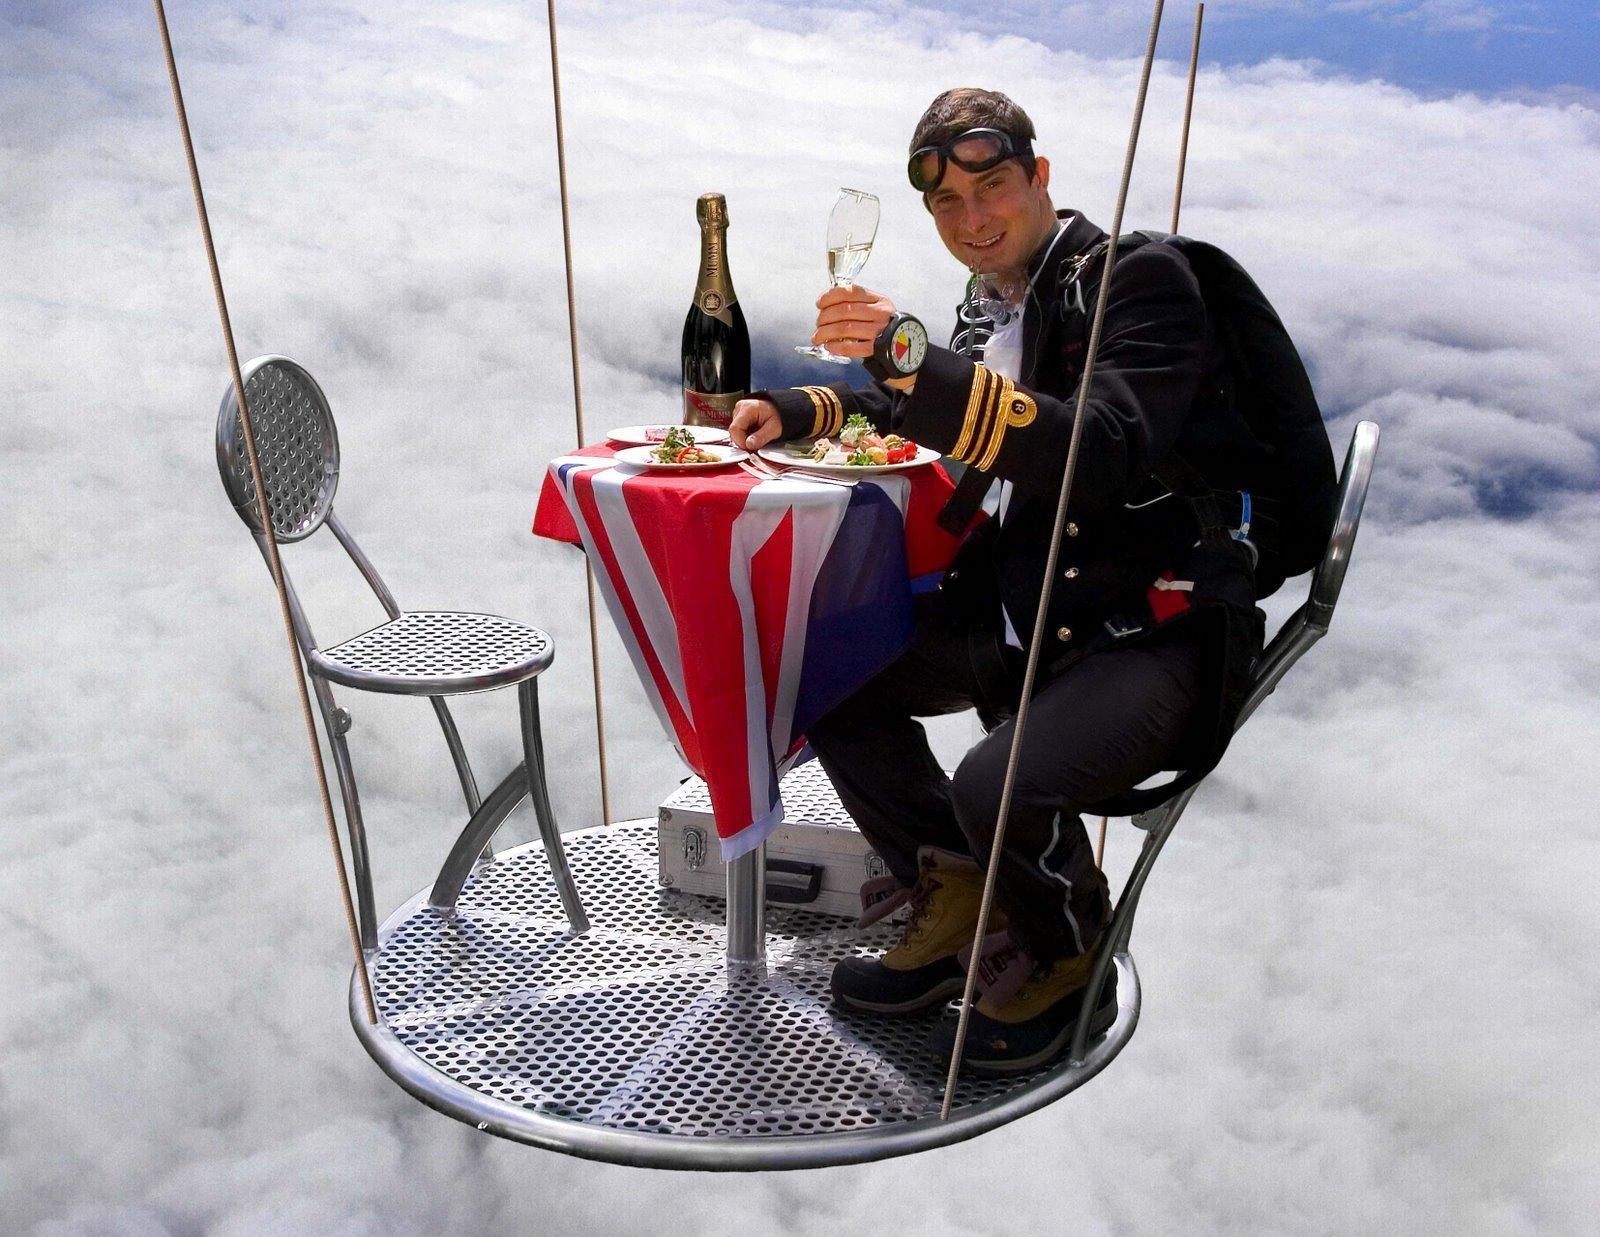 bear-grylls-high-altitude-ballooning-2.jpg